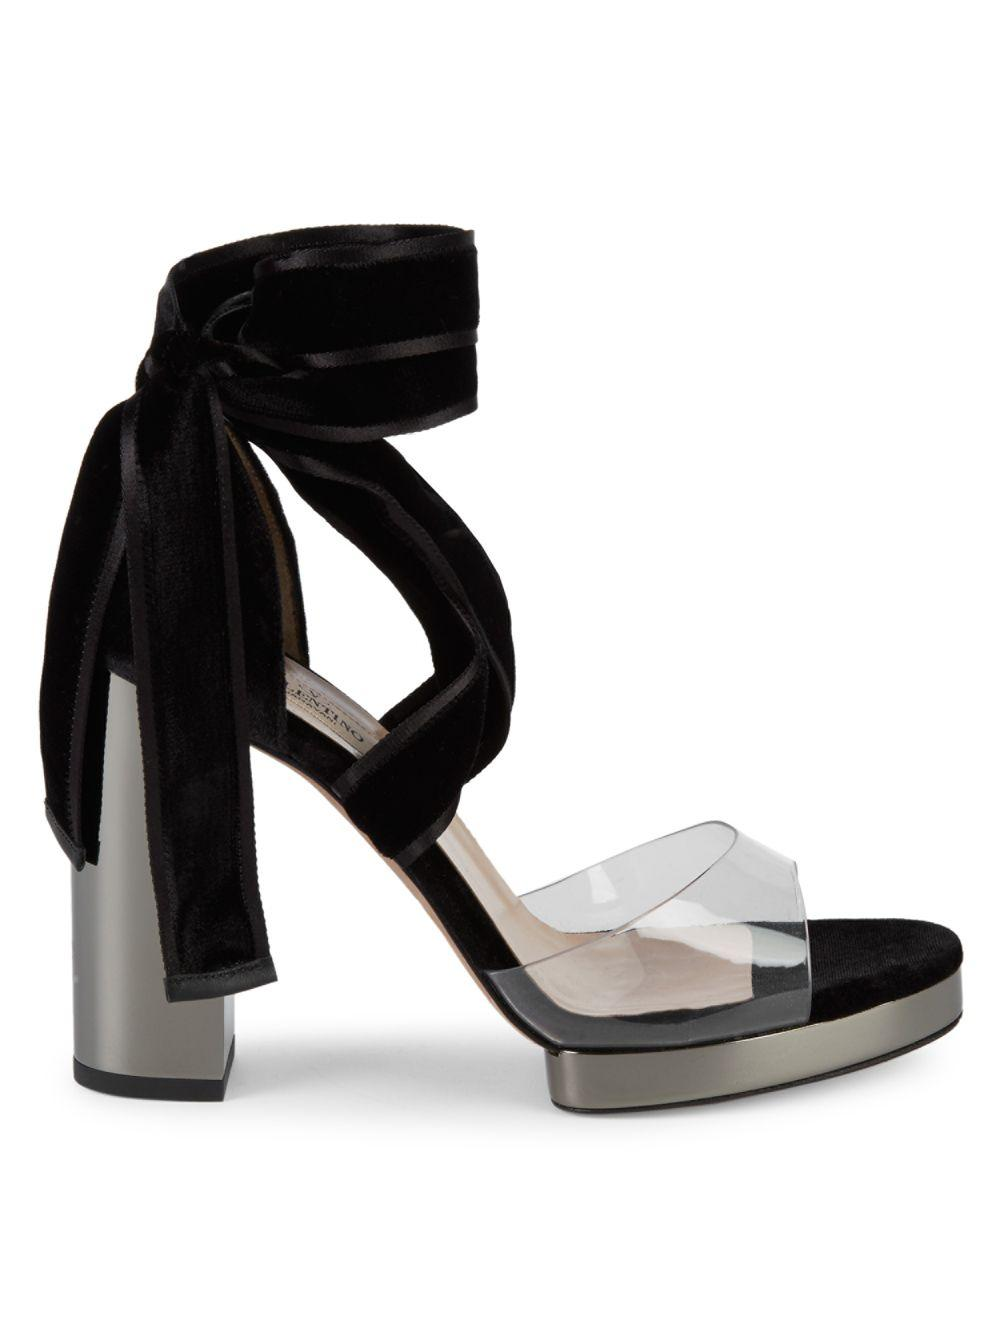 32cd22cfe8be Lyst - Valentino Velvet   Pvc Block-heel Sandals in Black